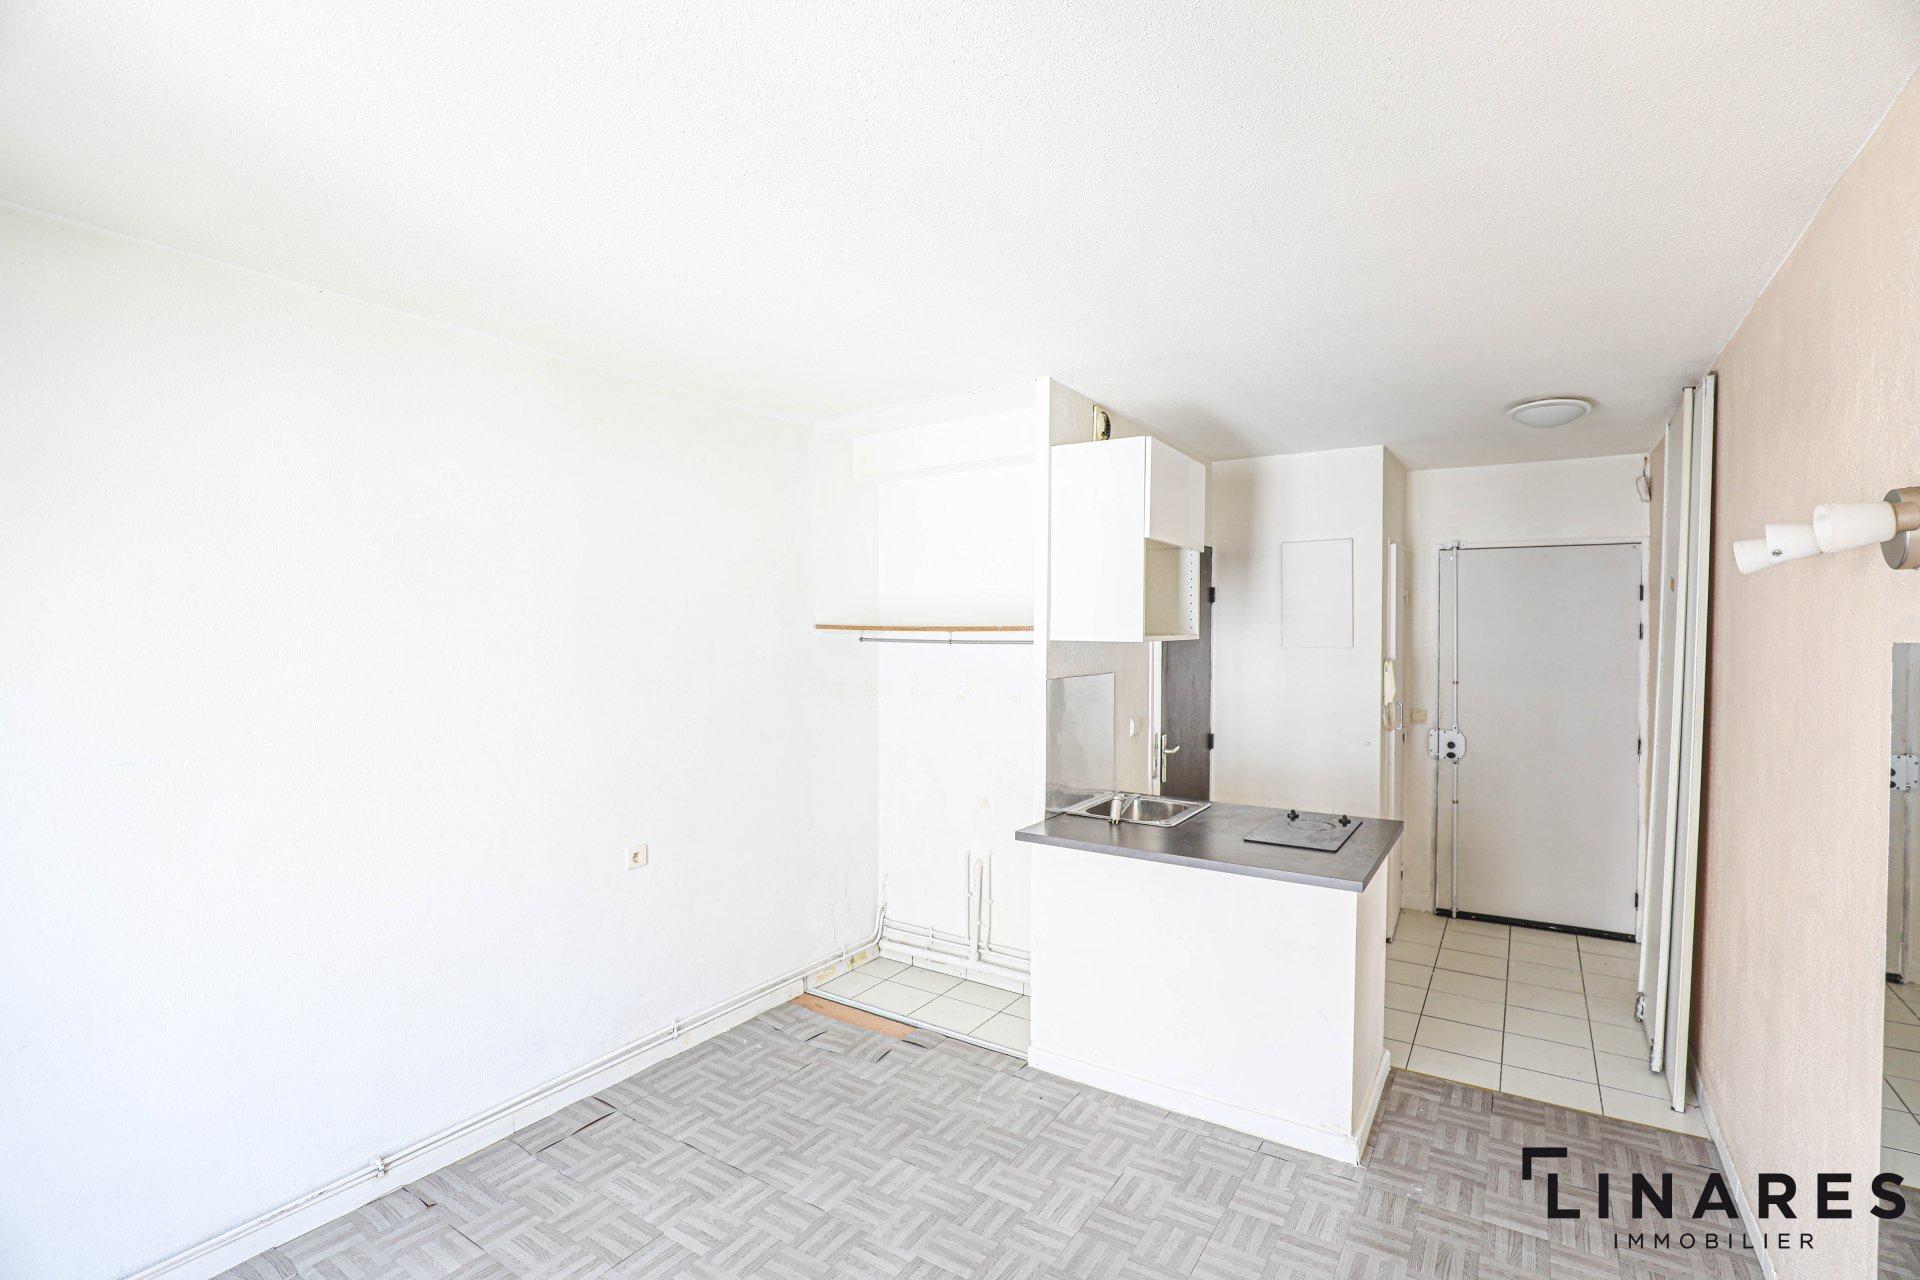 LLINARES INVEST - Appartement studio de 20m2 13005